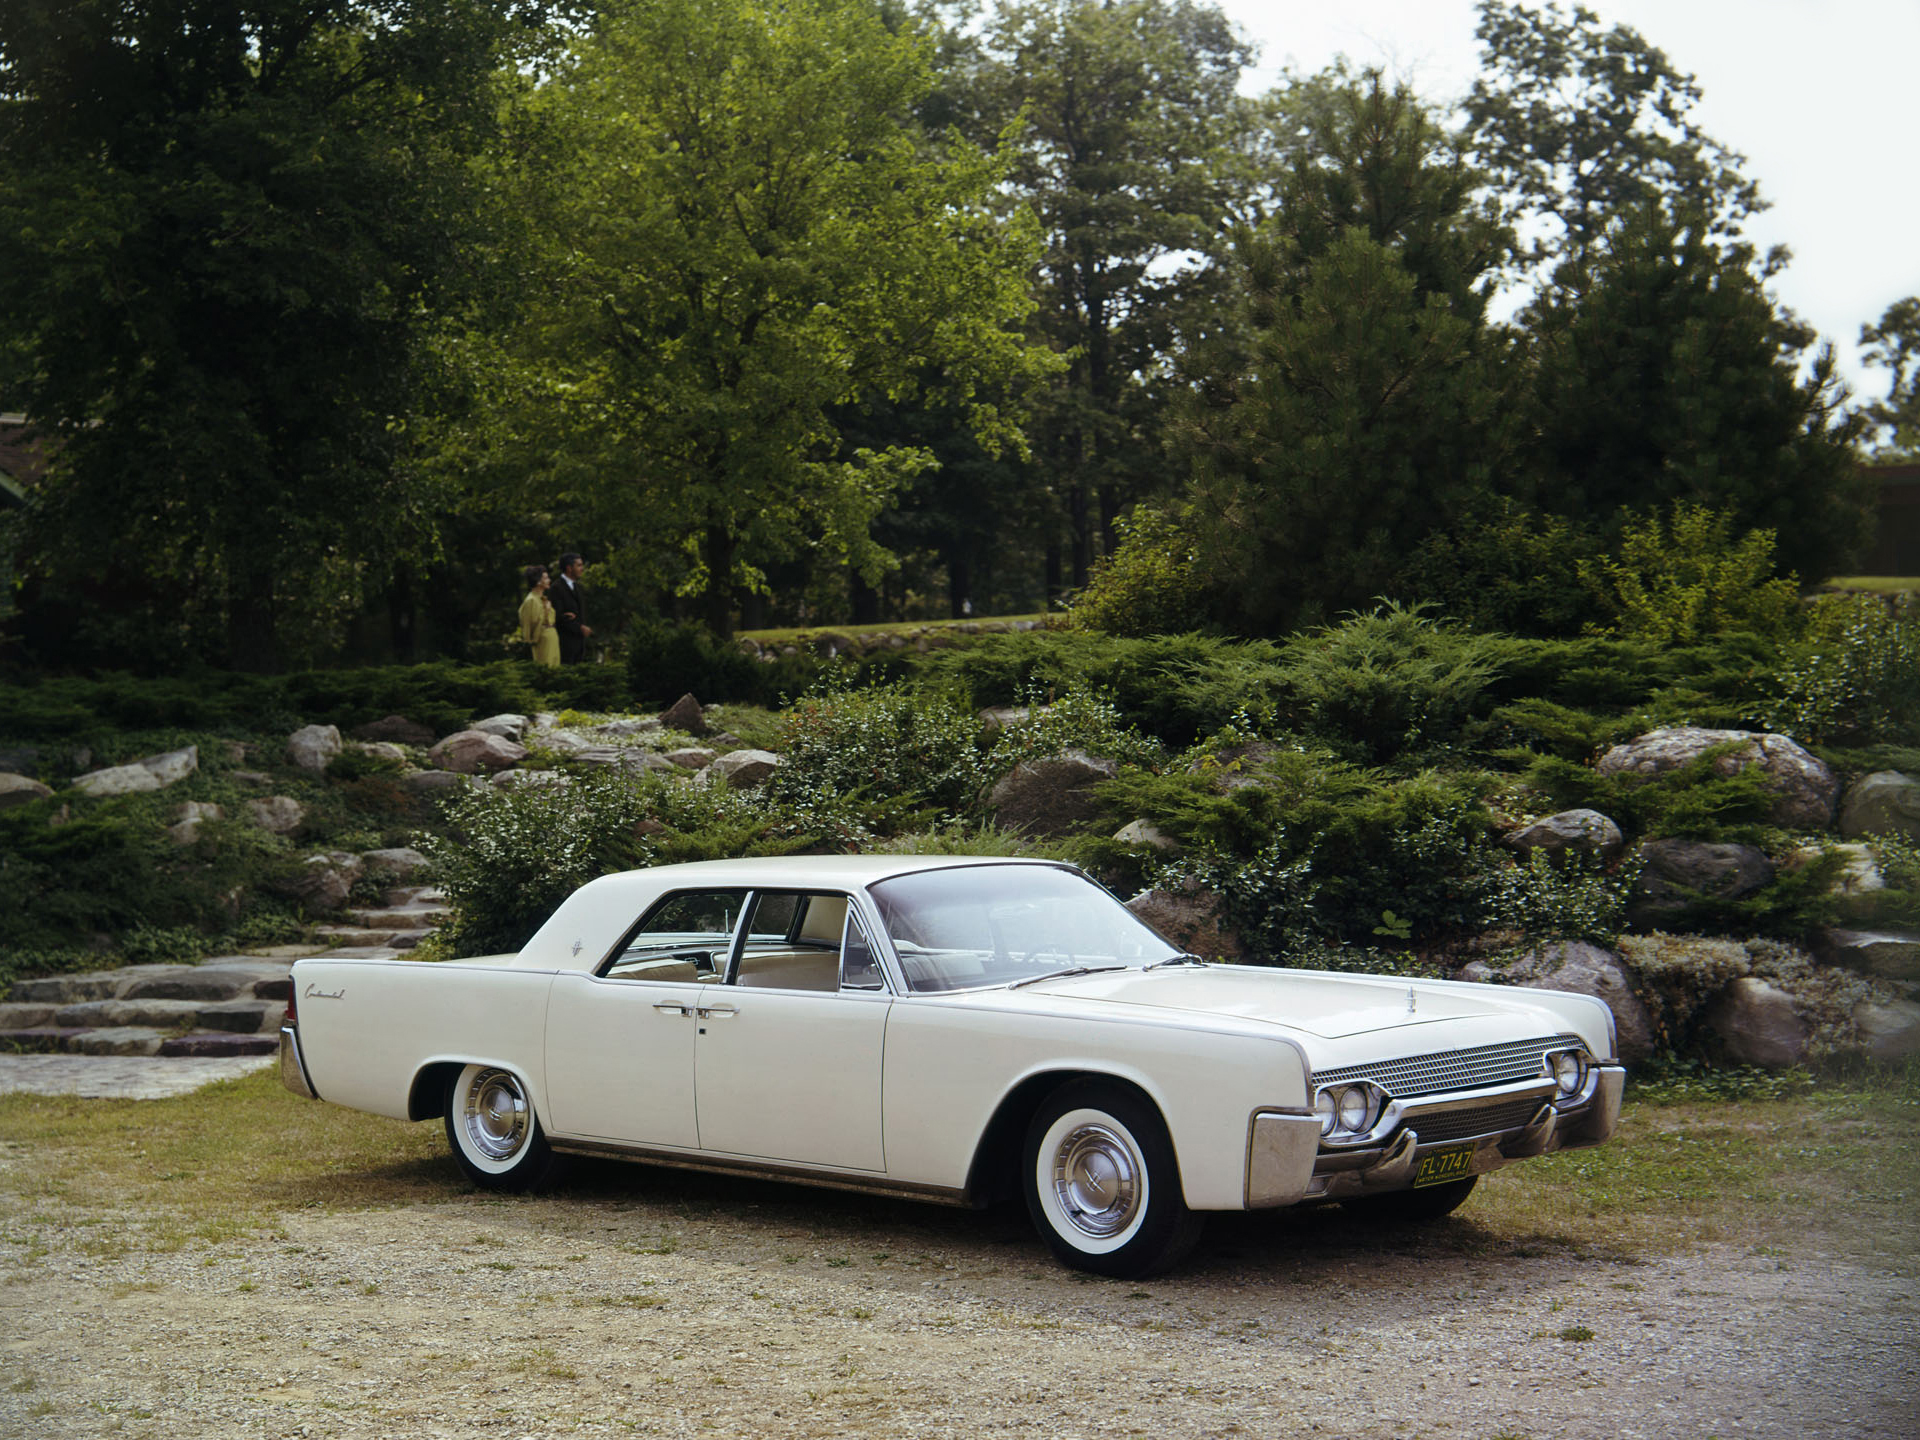 1961 lincoln continental sedan 53d wallpaper 1920x1440 153918 wallpaperup. Black Bedroom Furniture Sets. Home Design Ideas